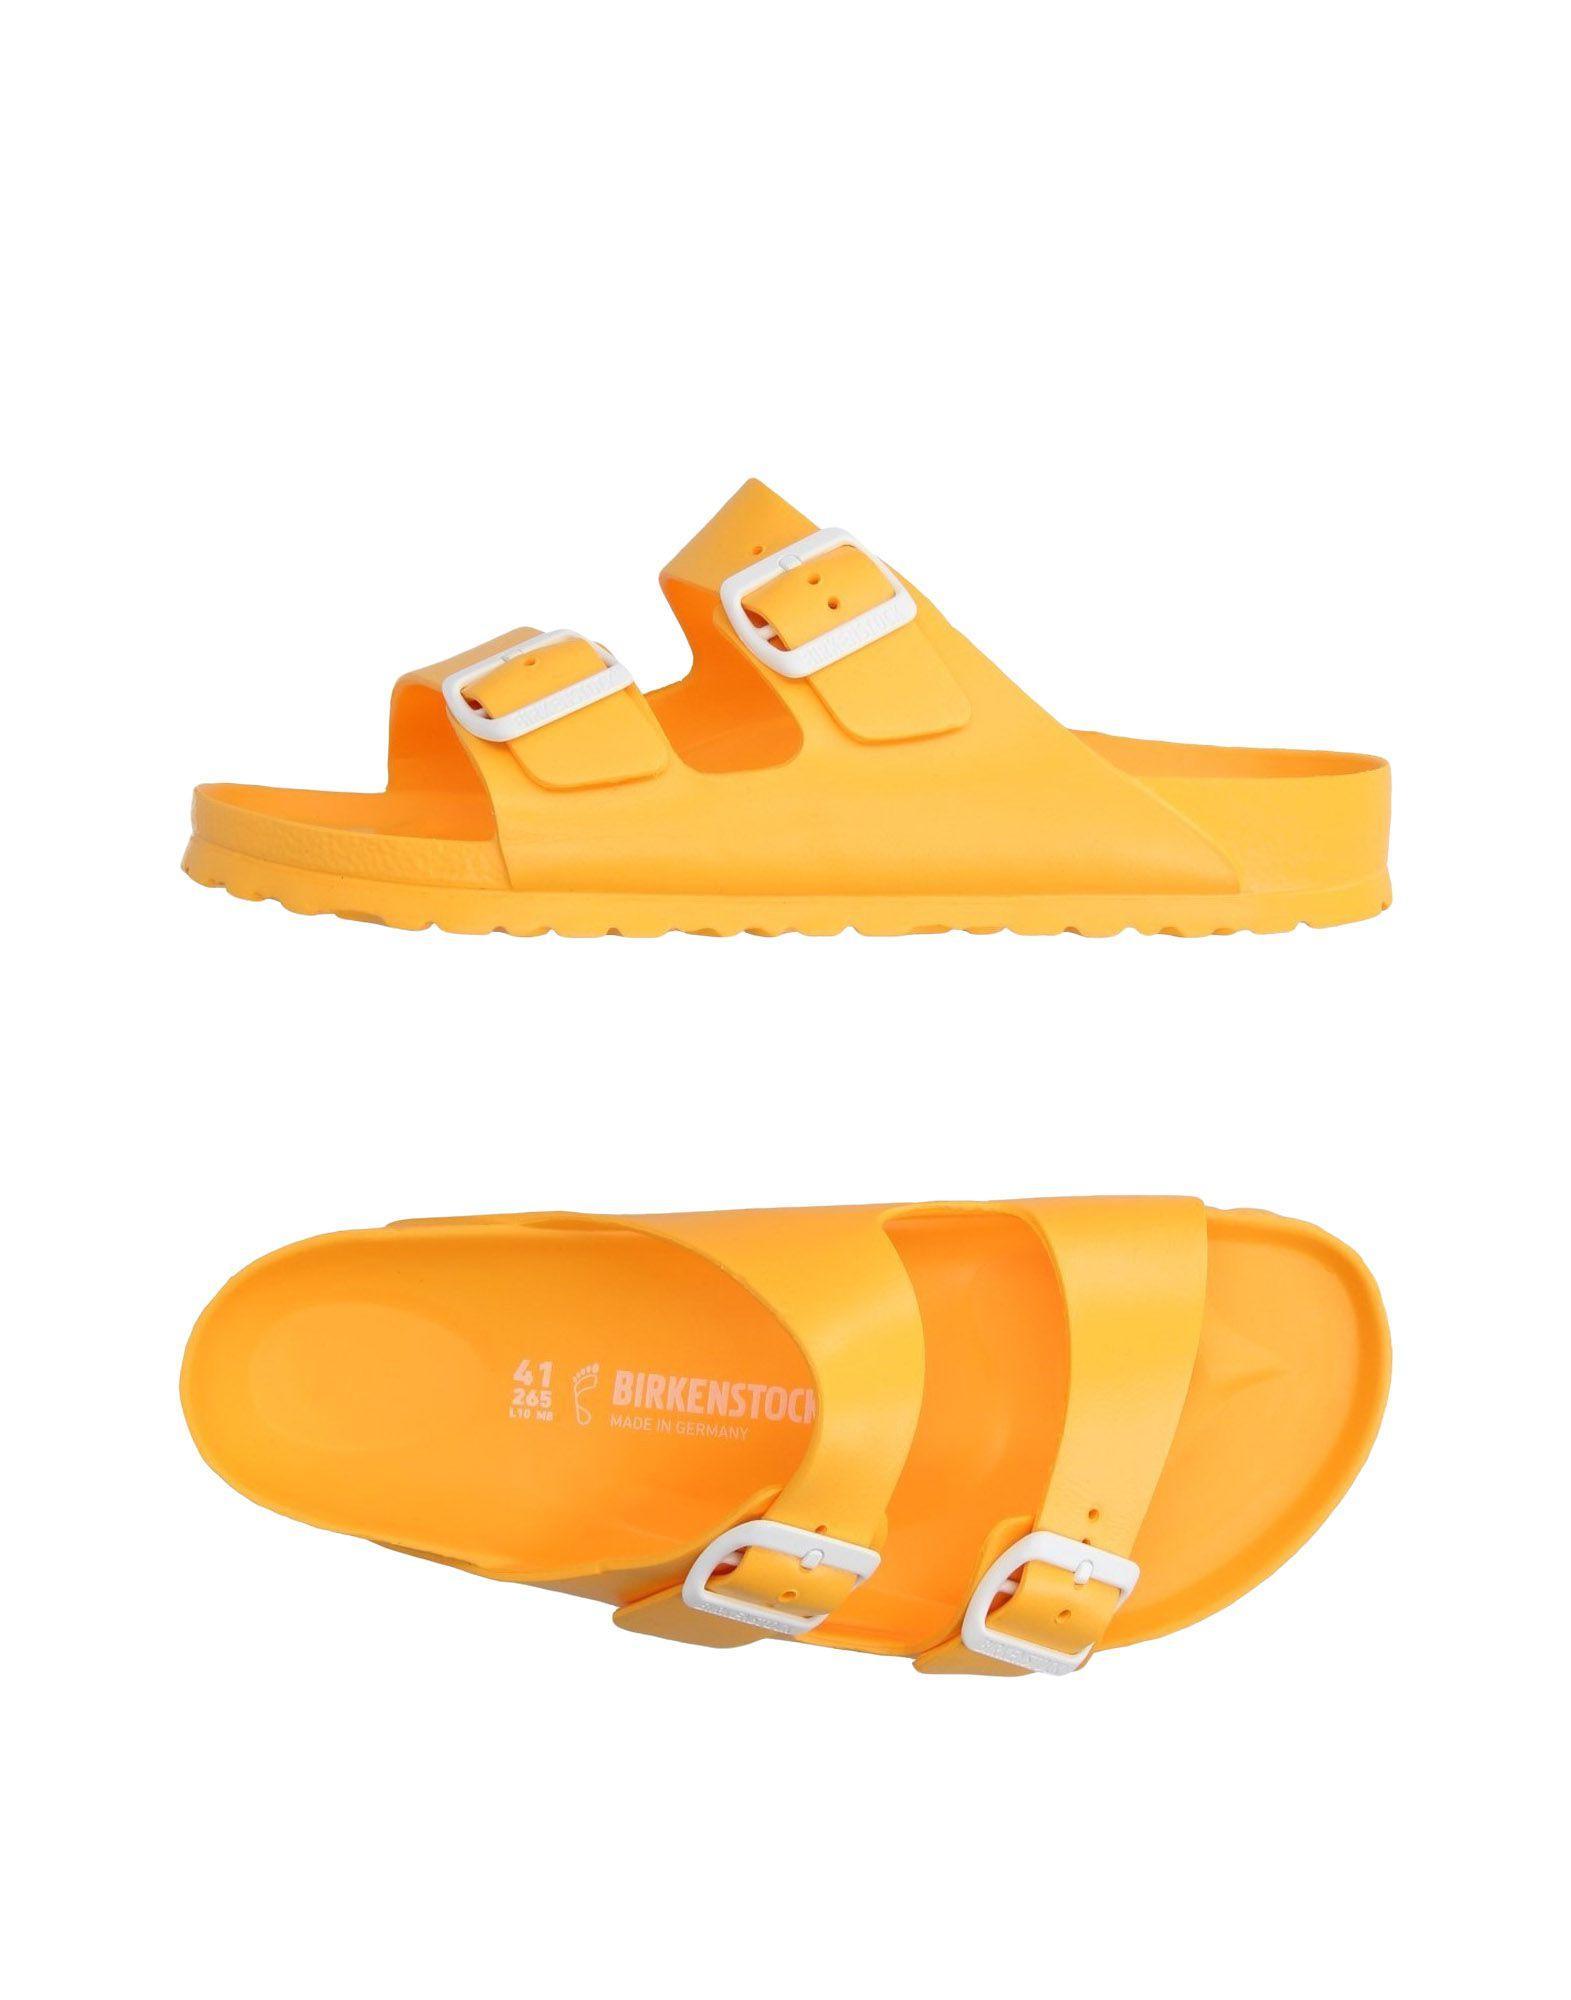 Rolf S Nyc Lyst Birkenstock Sandals In Yellow